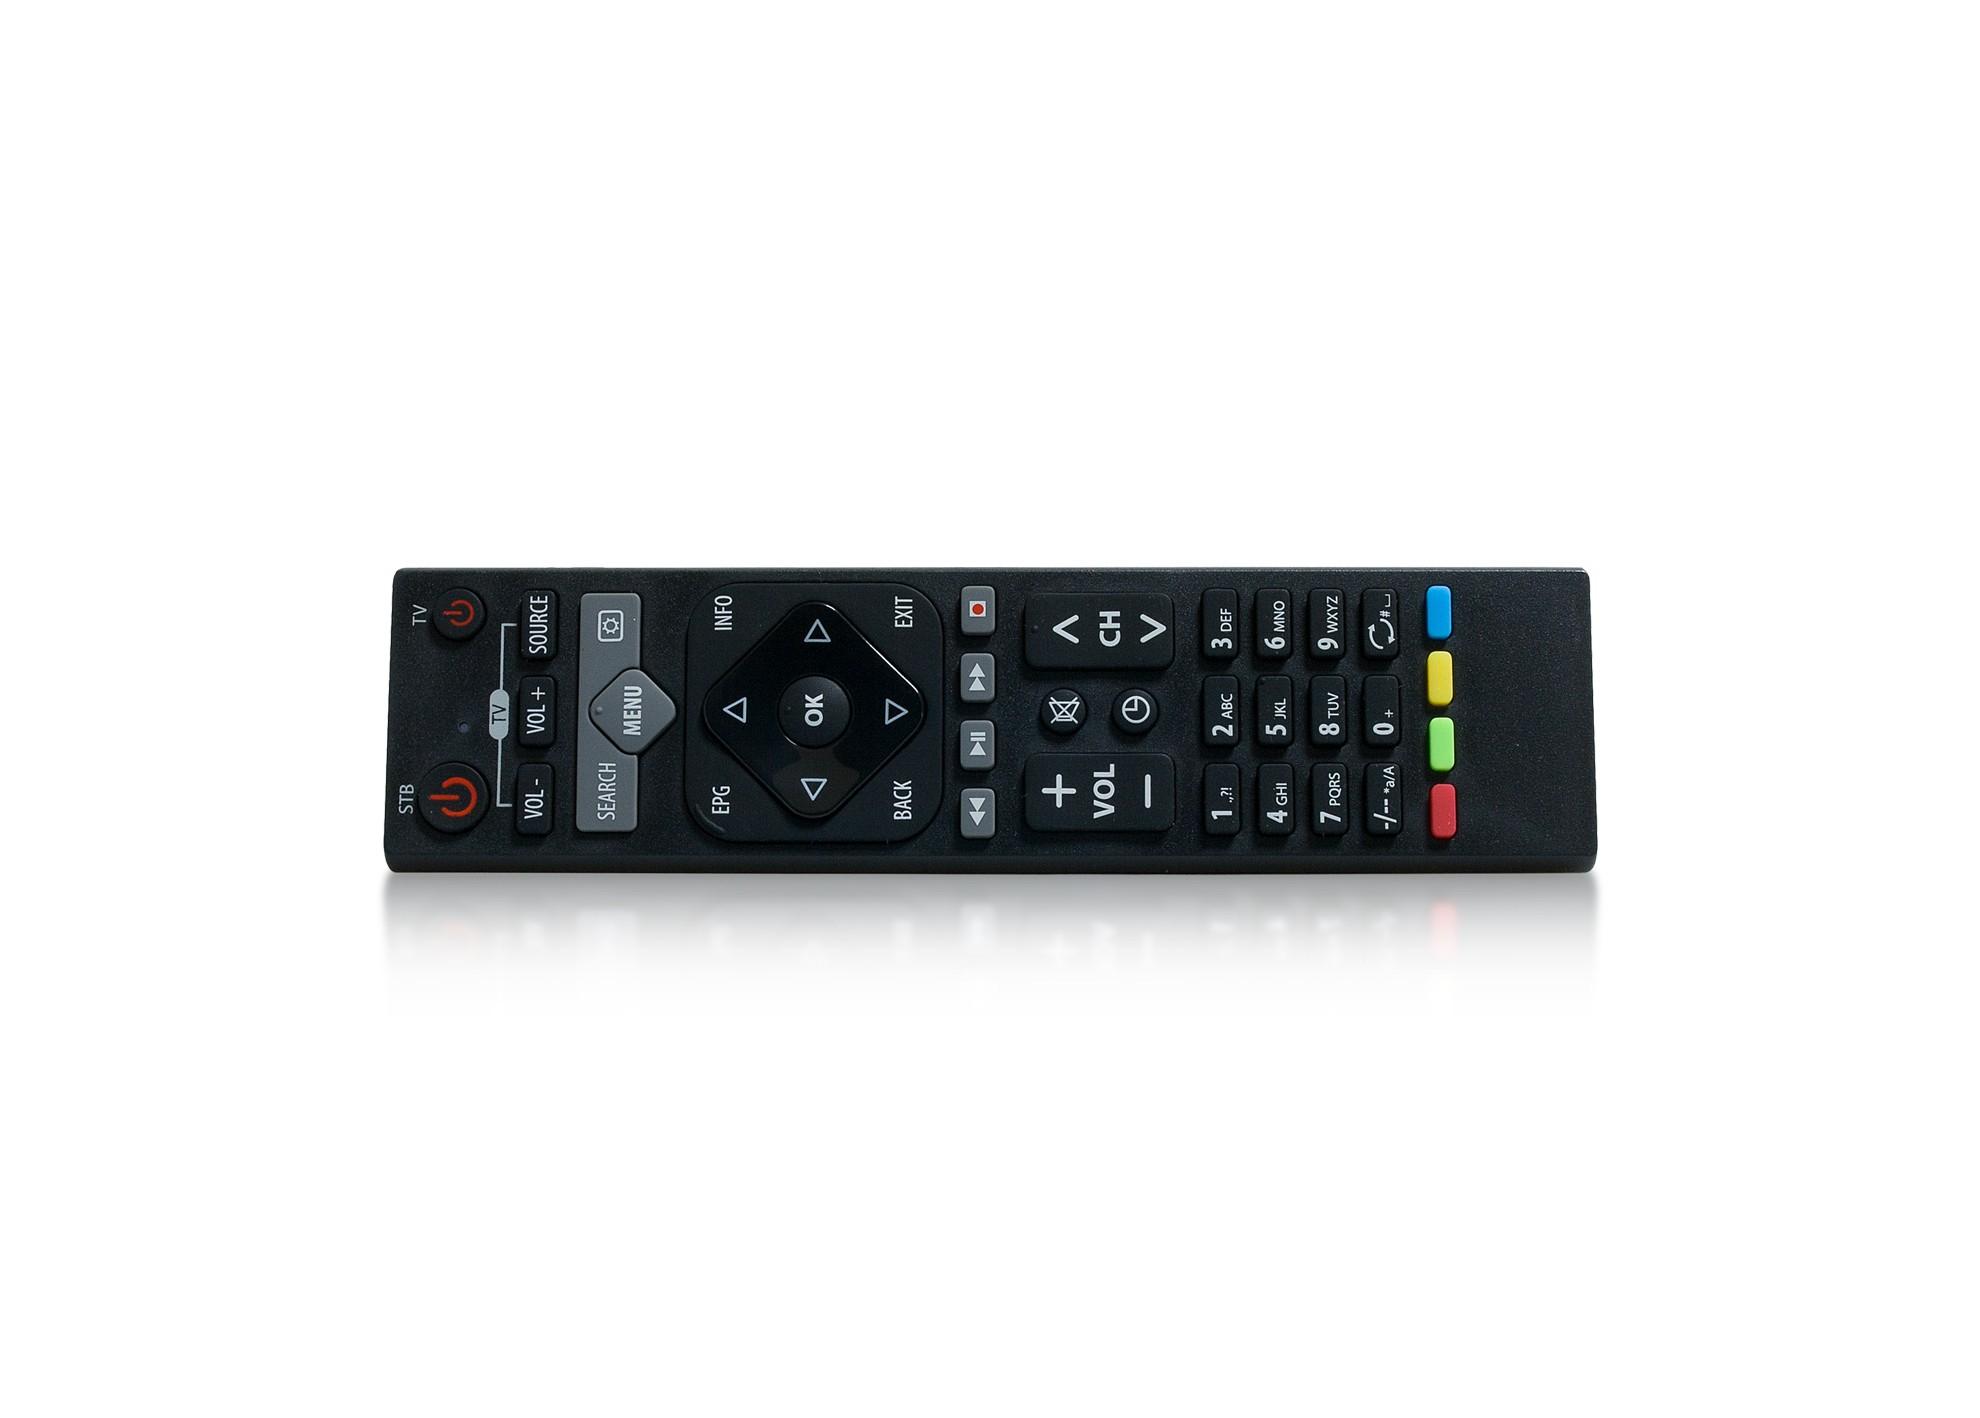 Antik Mini 3S Hybrid DVB-S2 + DVB-T2